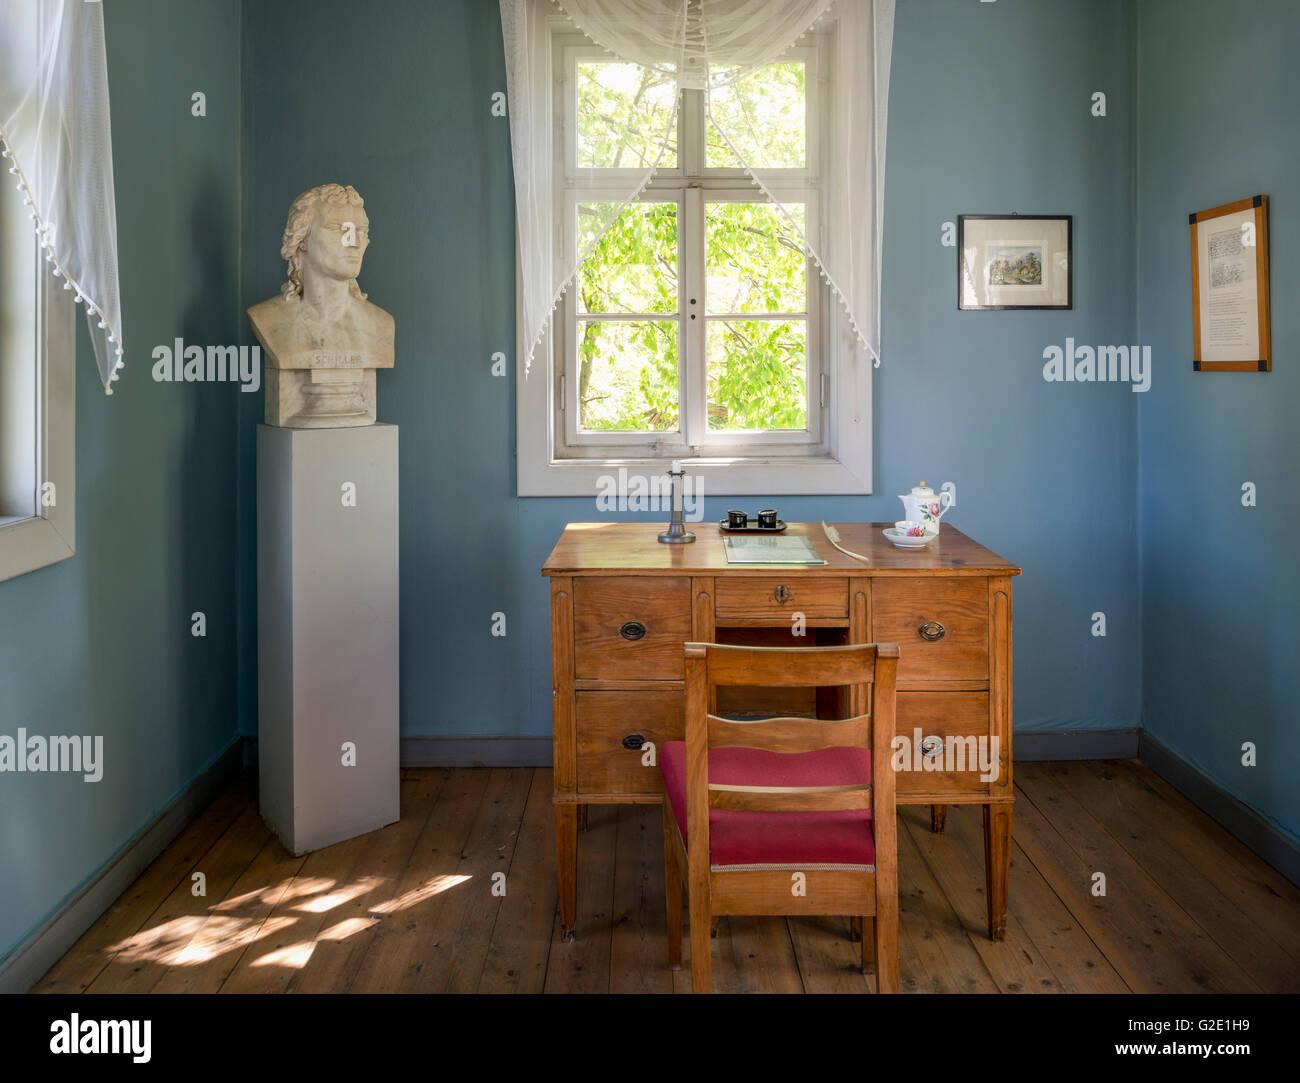 Study in Schiller's Gartenzinne, the garden house of Friedrich Schiller, Museum, Jena, Thuringia, Germany - Stock Image